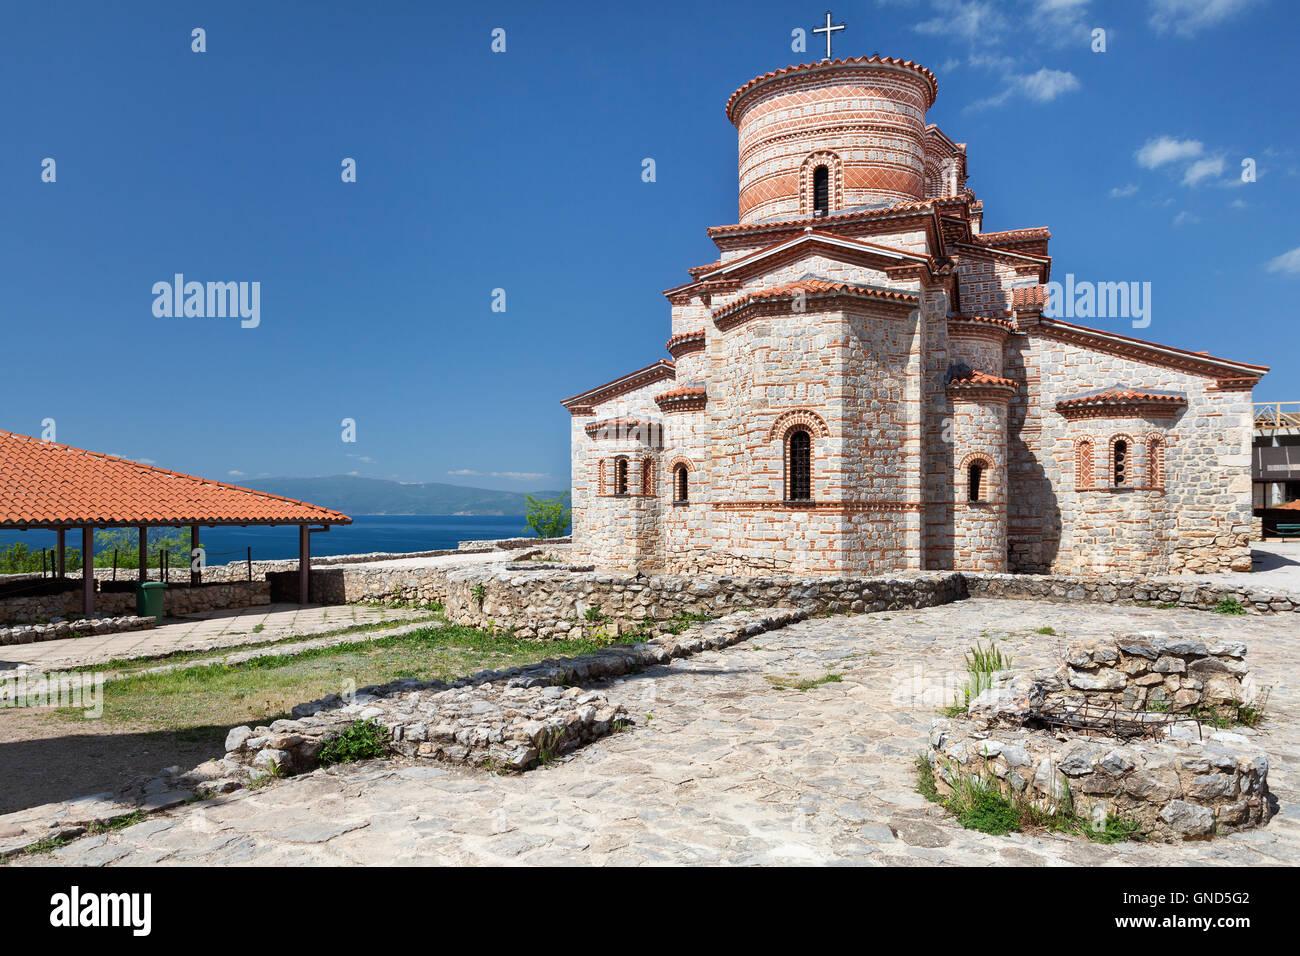 Saint Panteleimon monastery in Ohrid, Macedonia - Stock Image